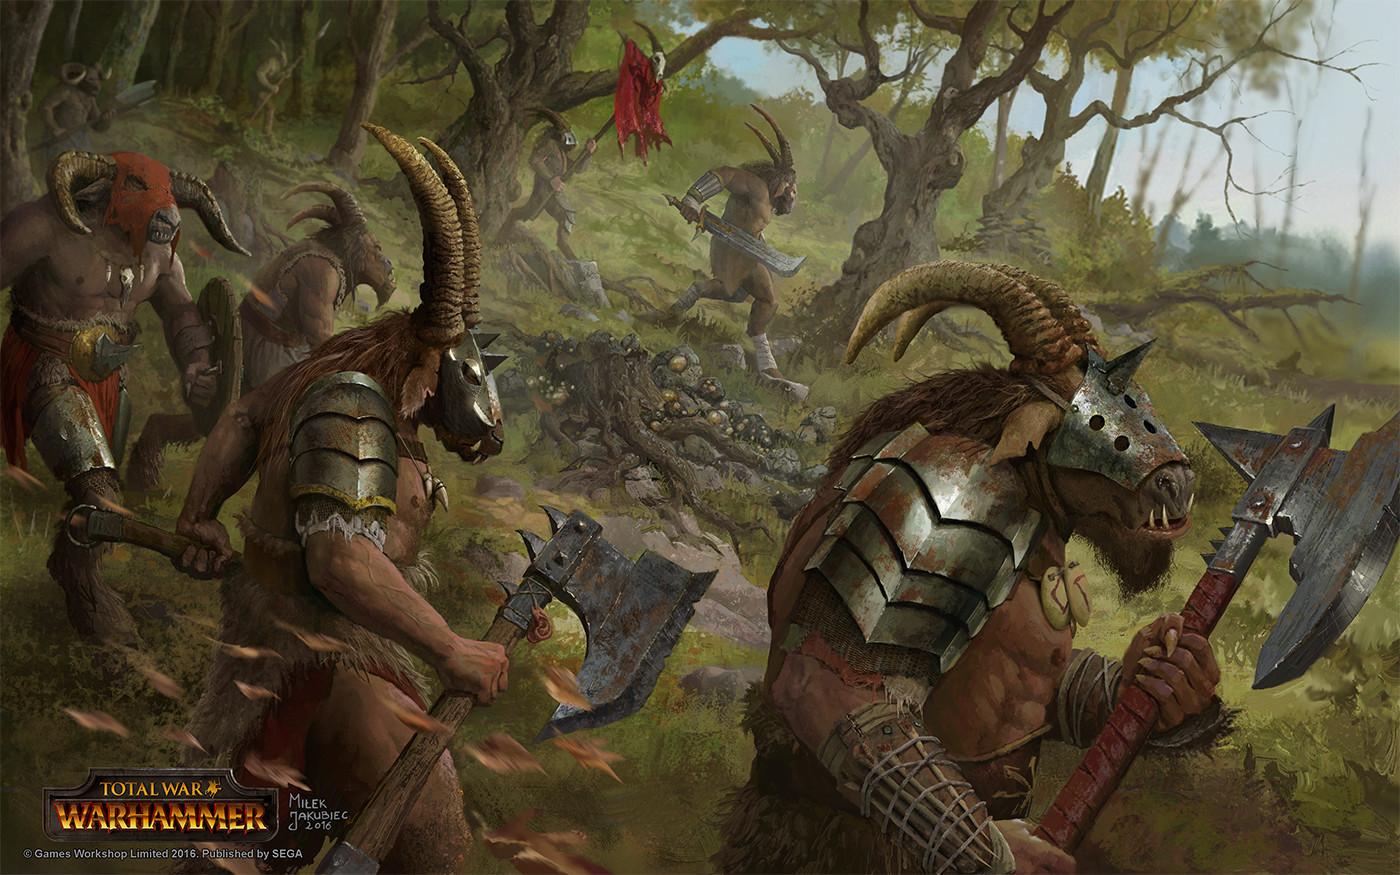 [Warhammer Fantasy Battle] Images diverses - Page 4 Milek-jakubiec-beastmen-loading-screen